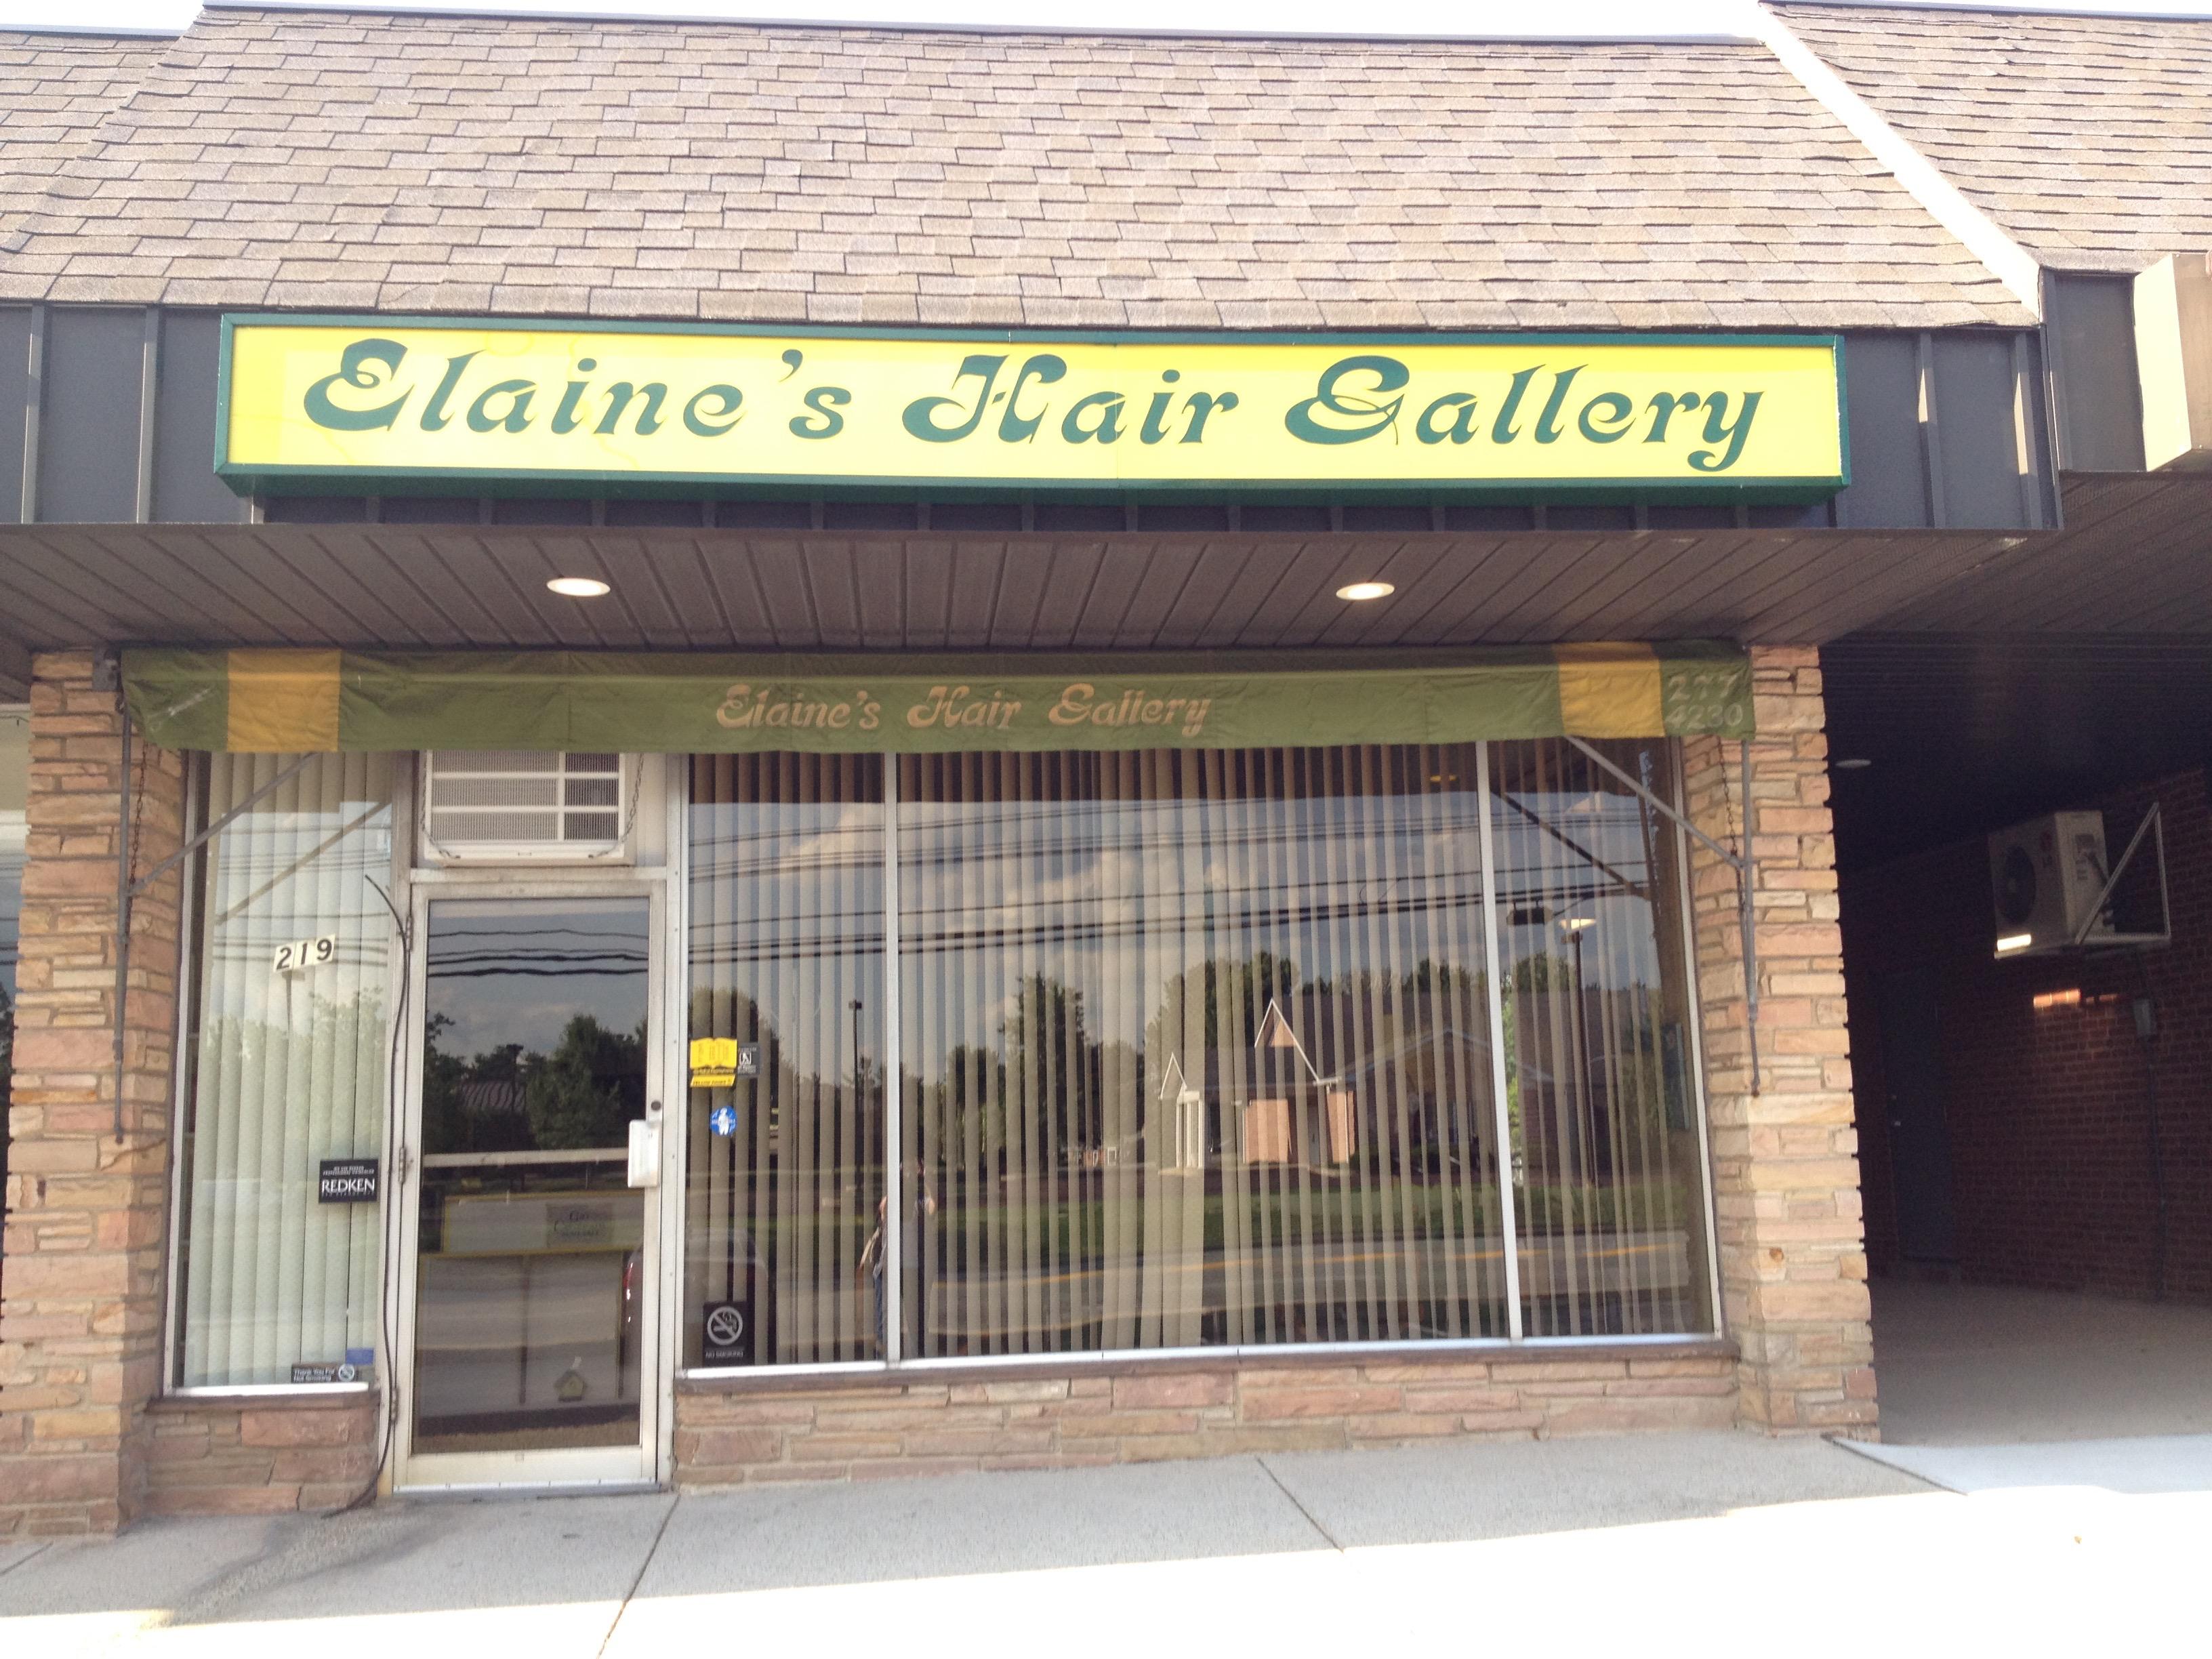 Elaine's Hair Gallery, Norristown PA